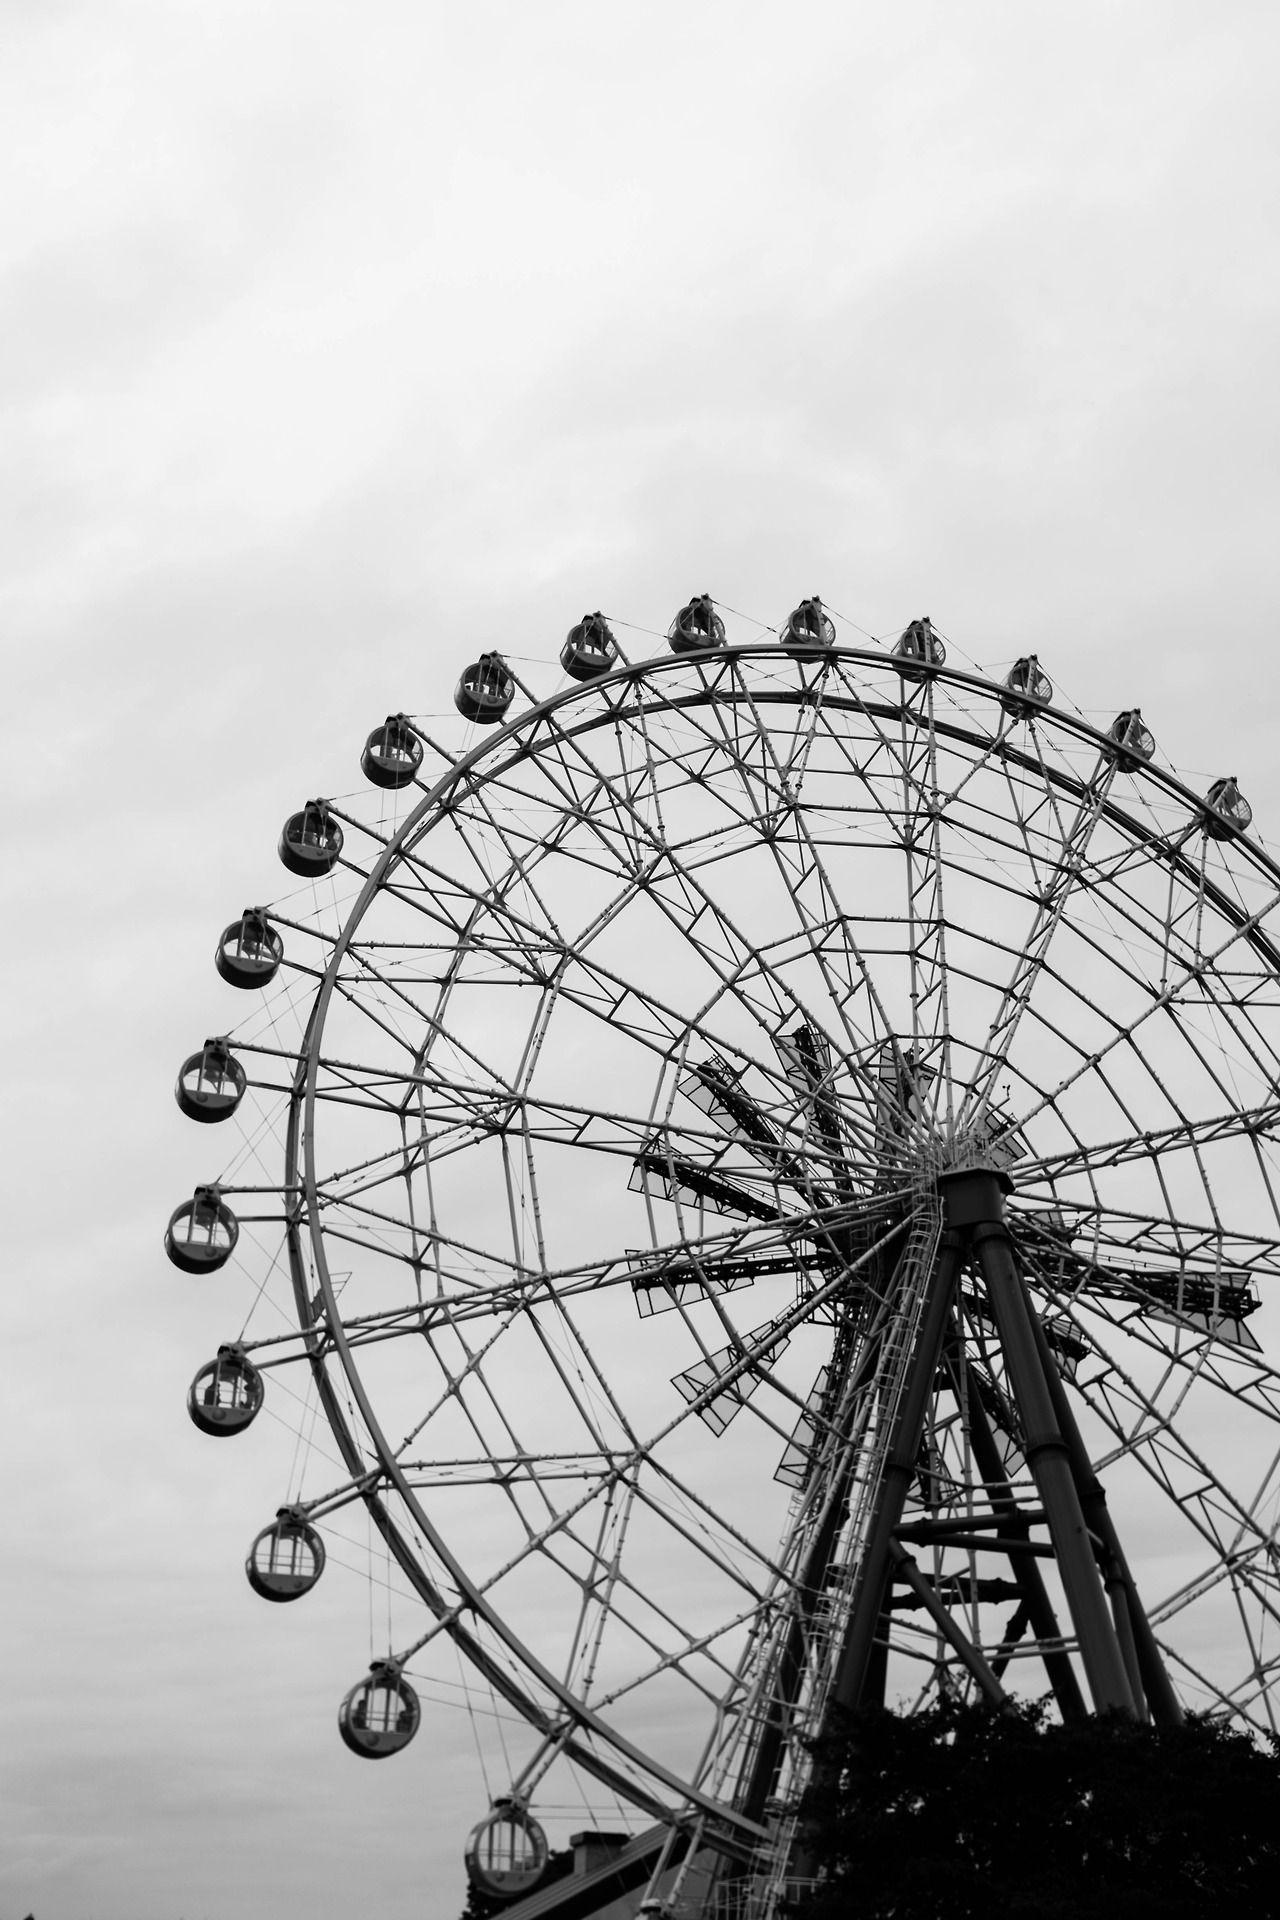 N S Photo Ferris Wheel モノクロフォト